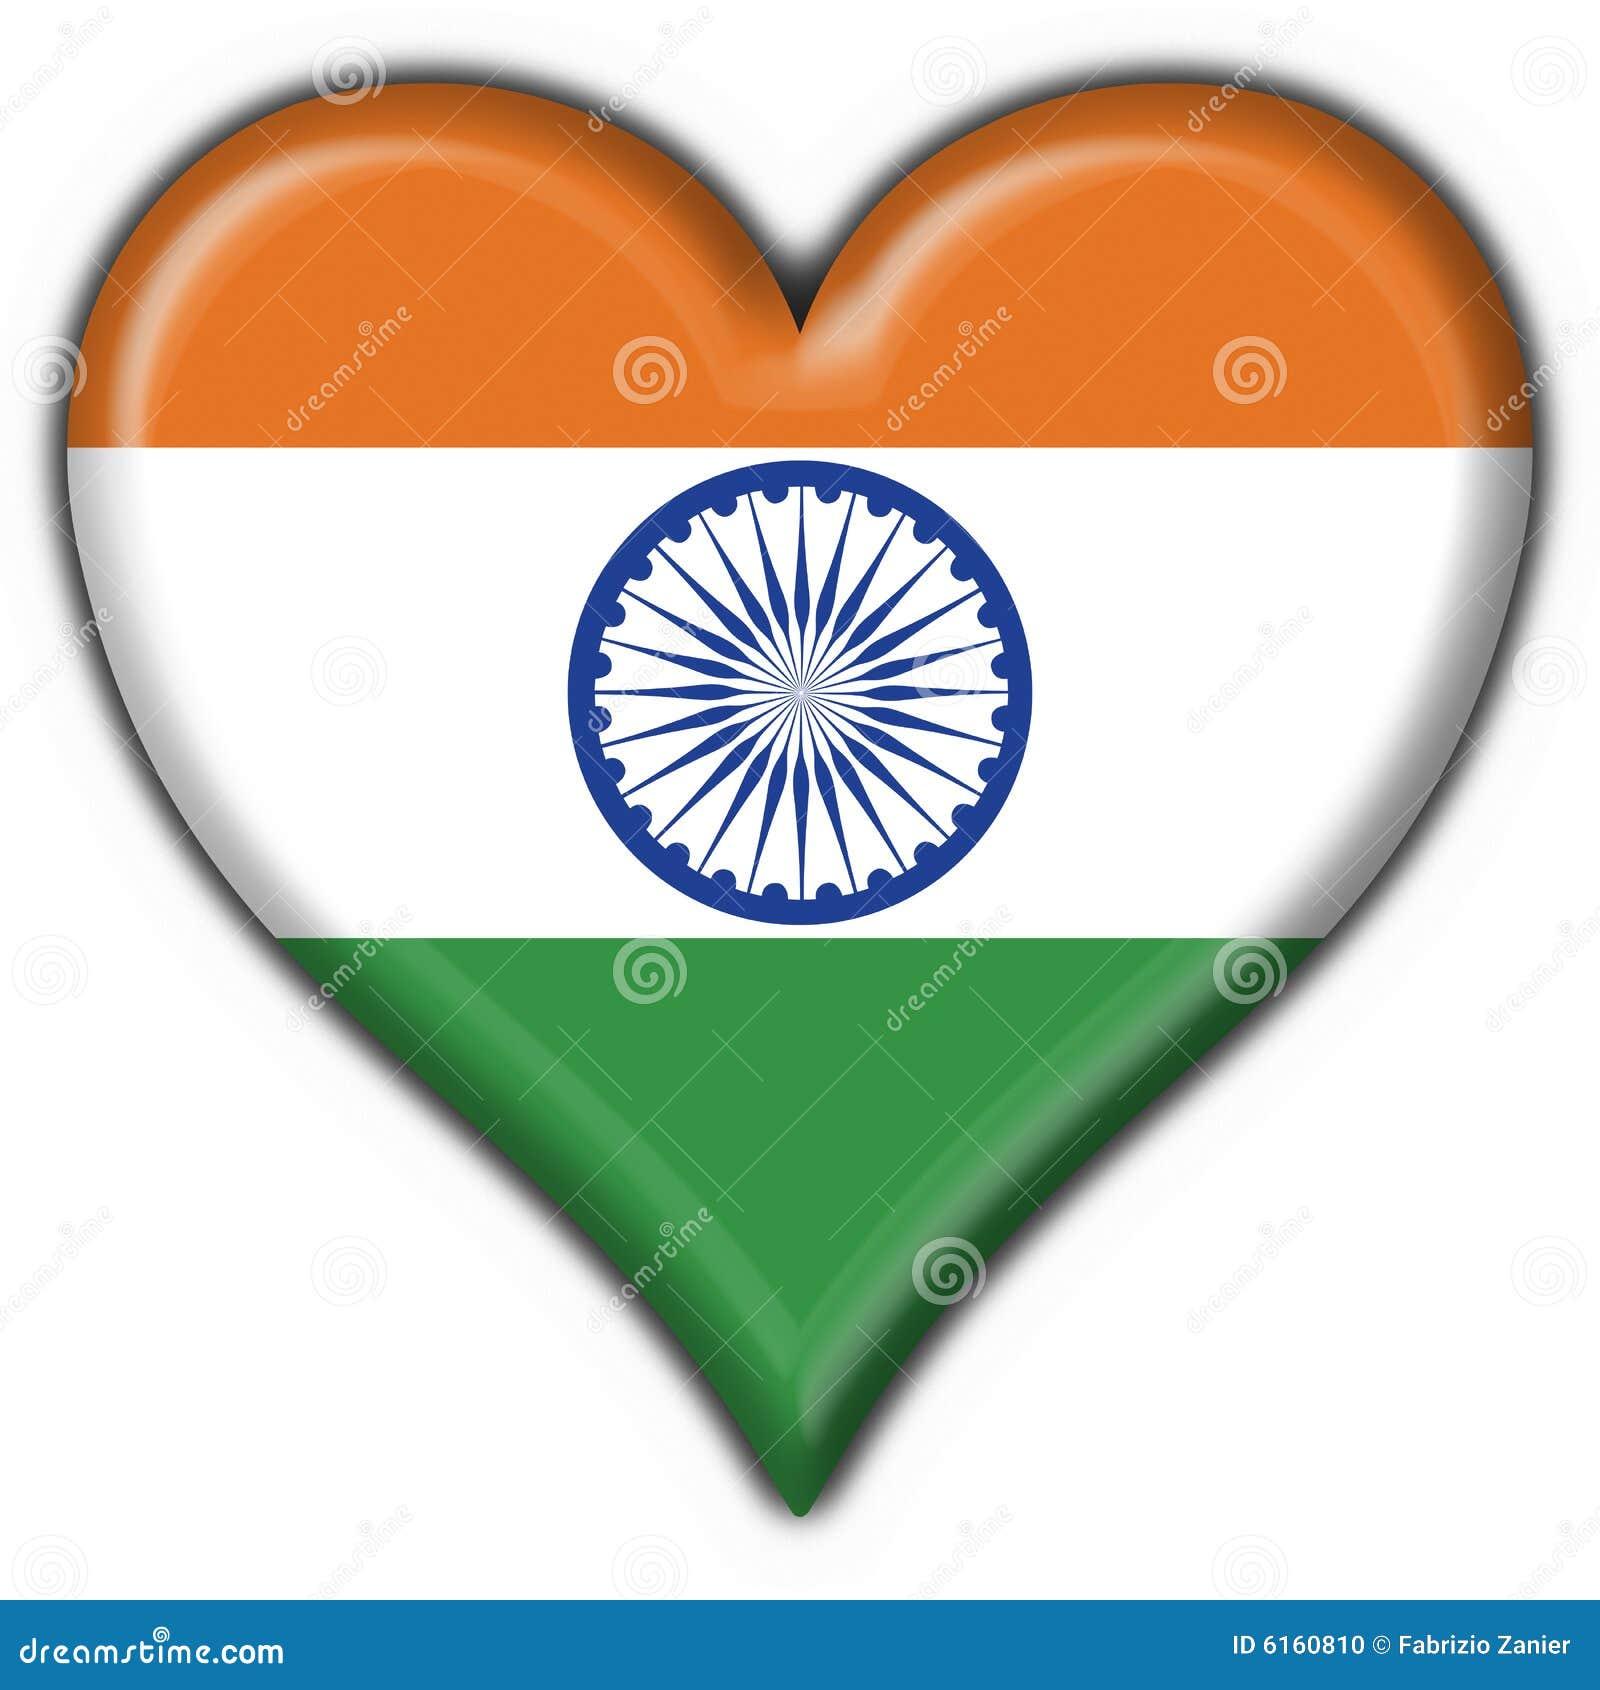 india button flag heart shape stock illustration illustration of